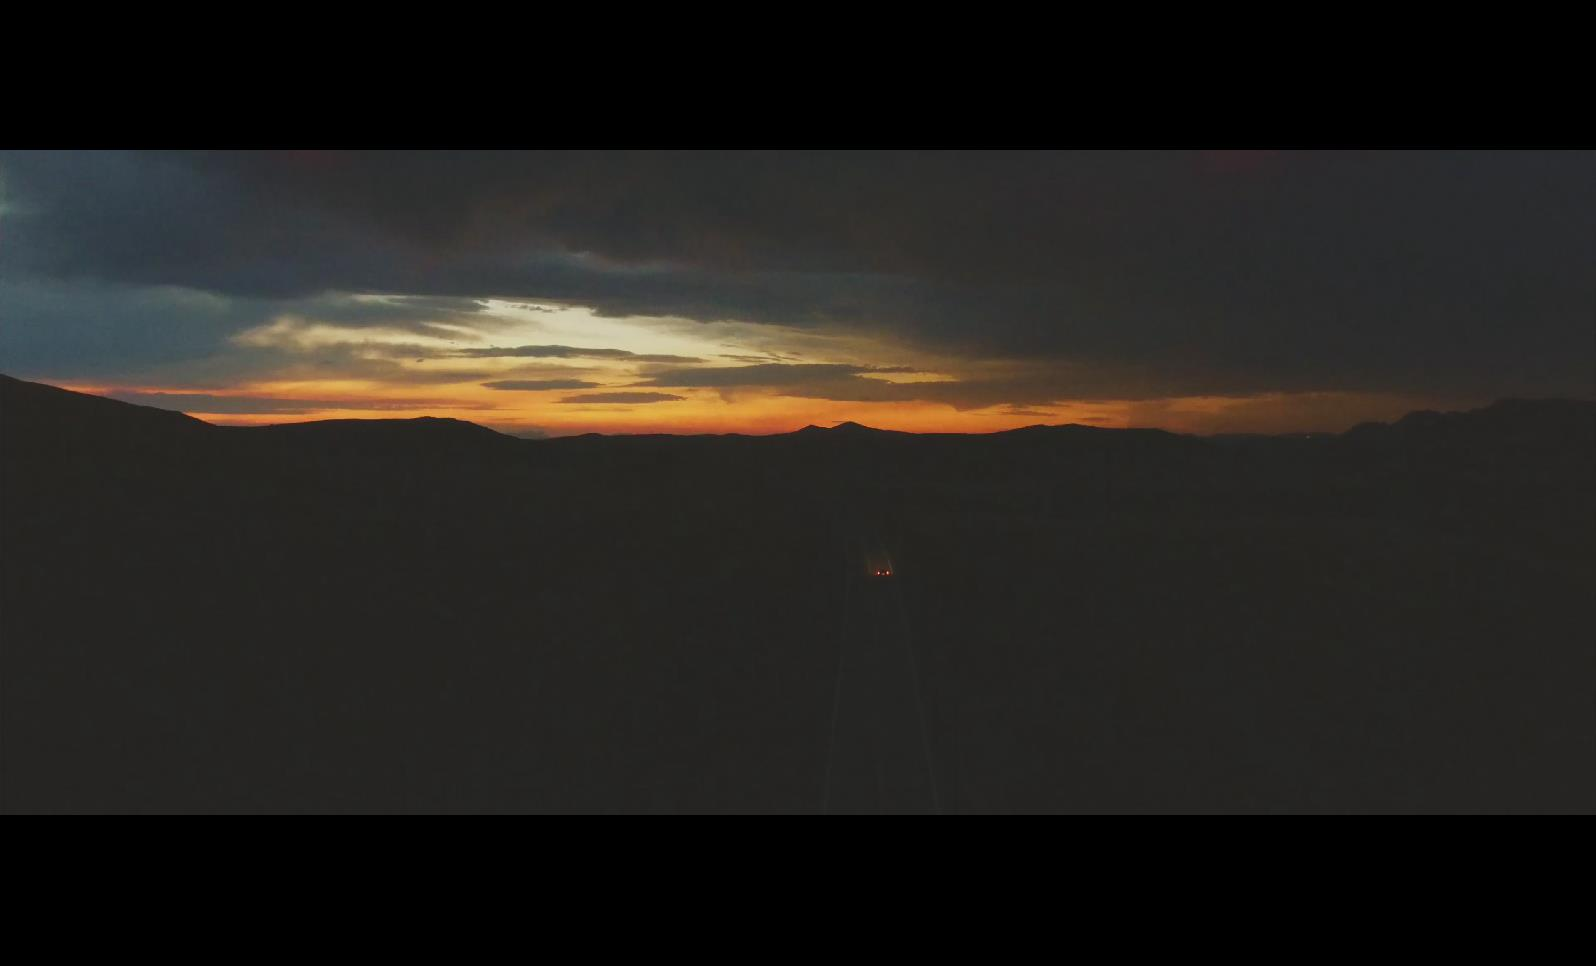 CS 09 航拍阿拉斯加自然风景